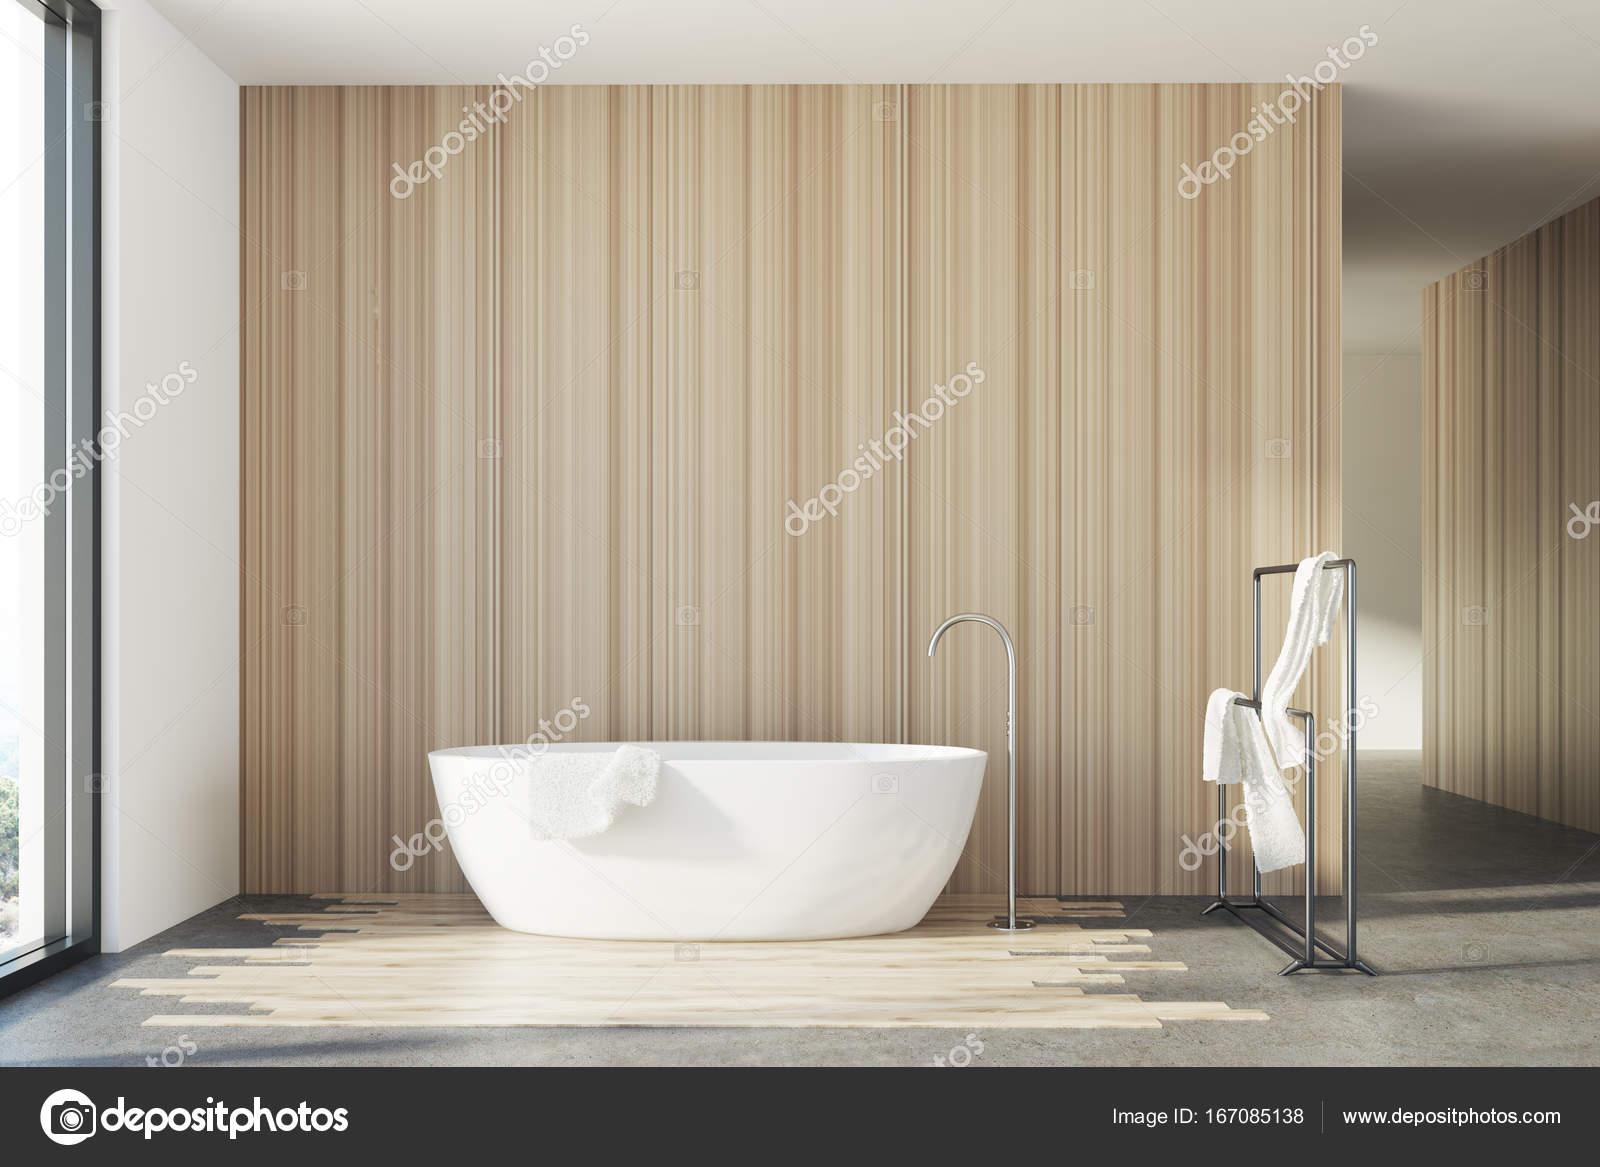 Vasca Da Bagno In Legno : Vasca da bagno in legno bianco u foto stock denisismagilov